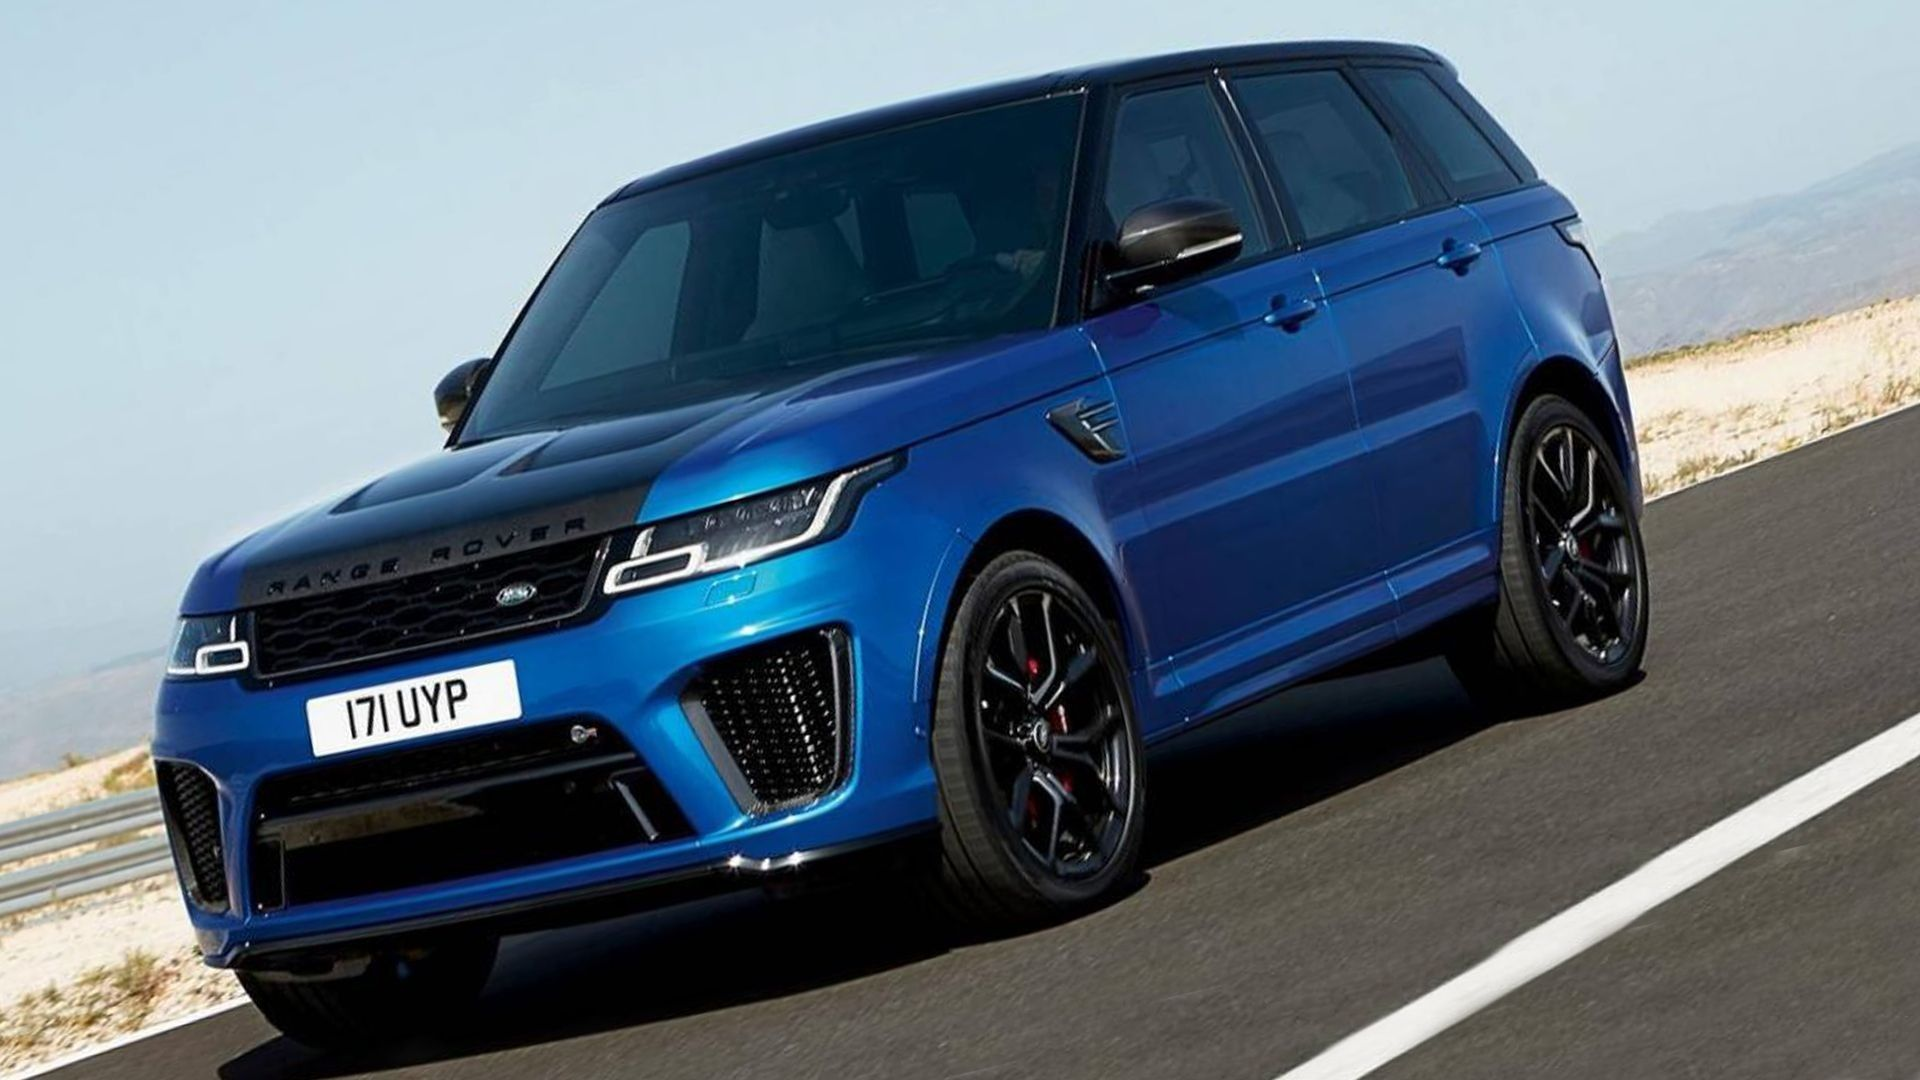 2019 Range Rover Sport Exterior Range Rover Sport Range Rover Range Rover Sport Review